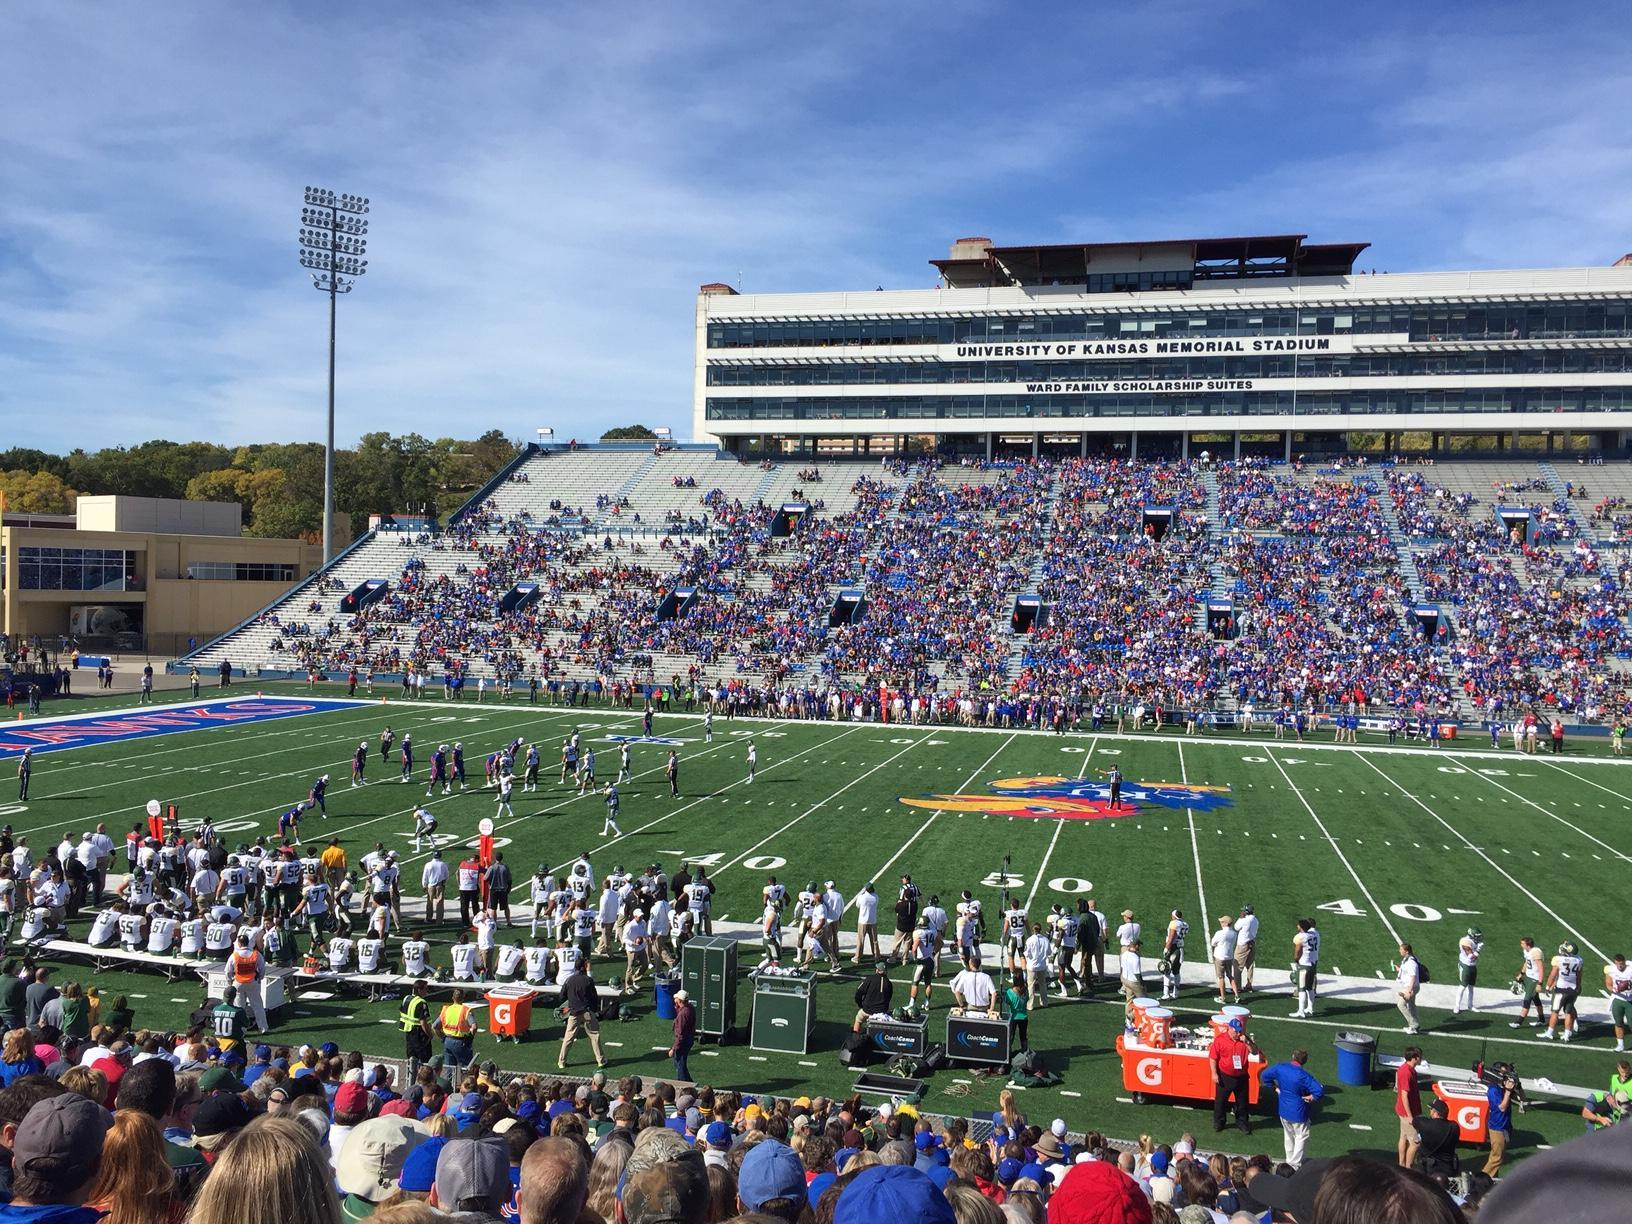 David Booth Kansas Memorial Stadium Section 21 Row 25 Seat 12